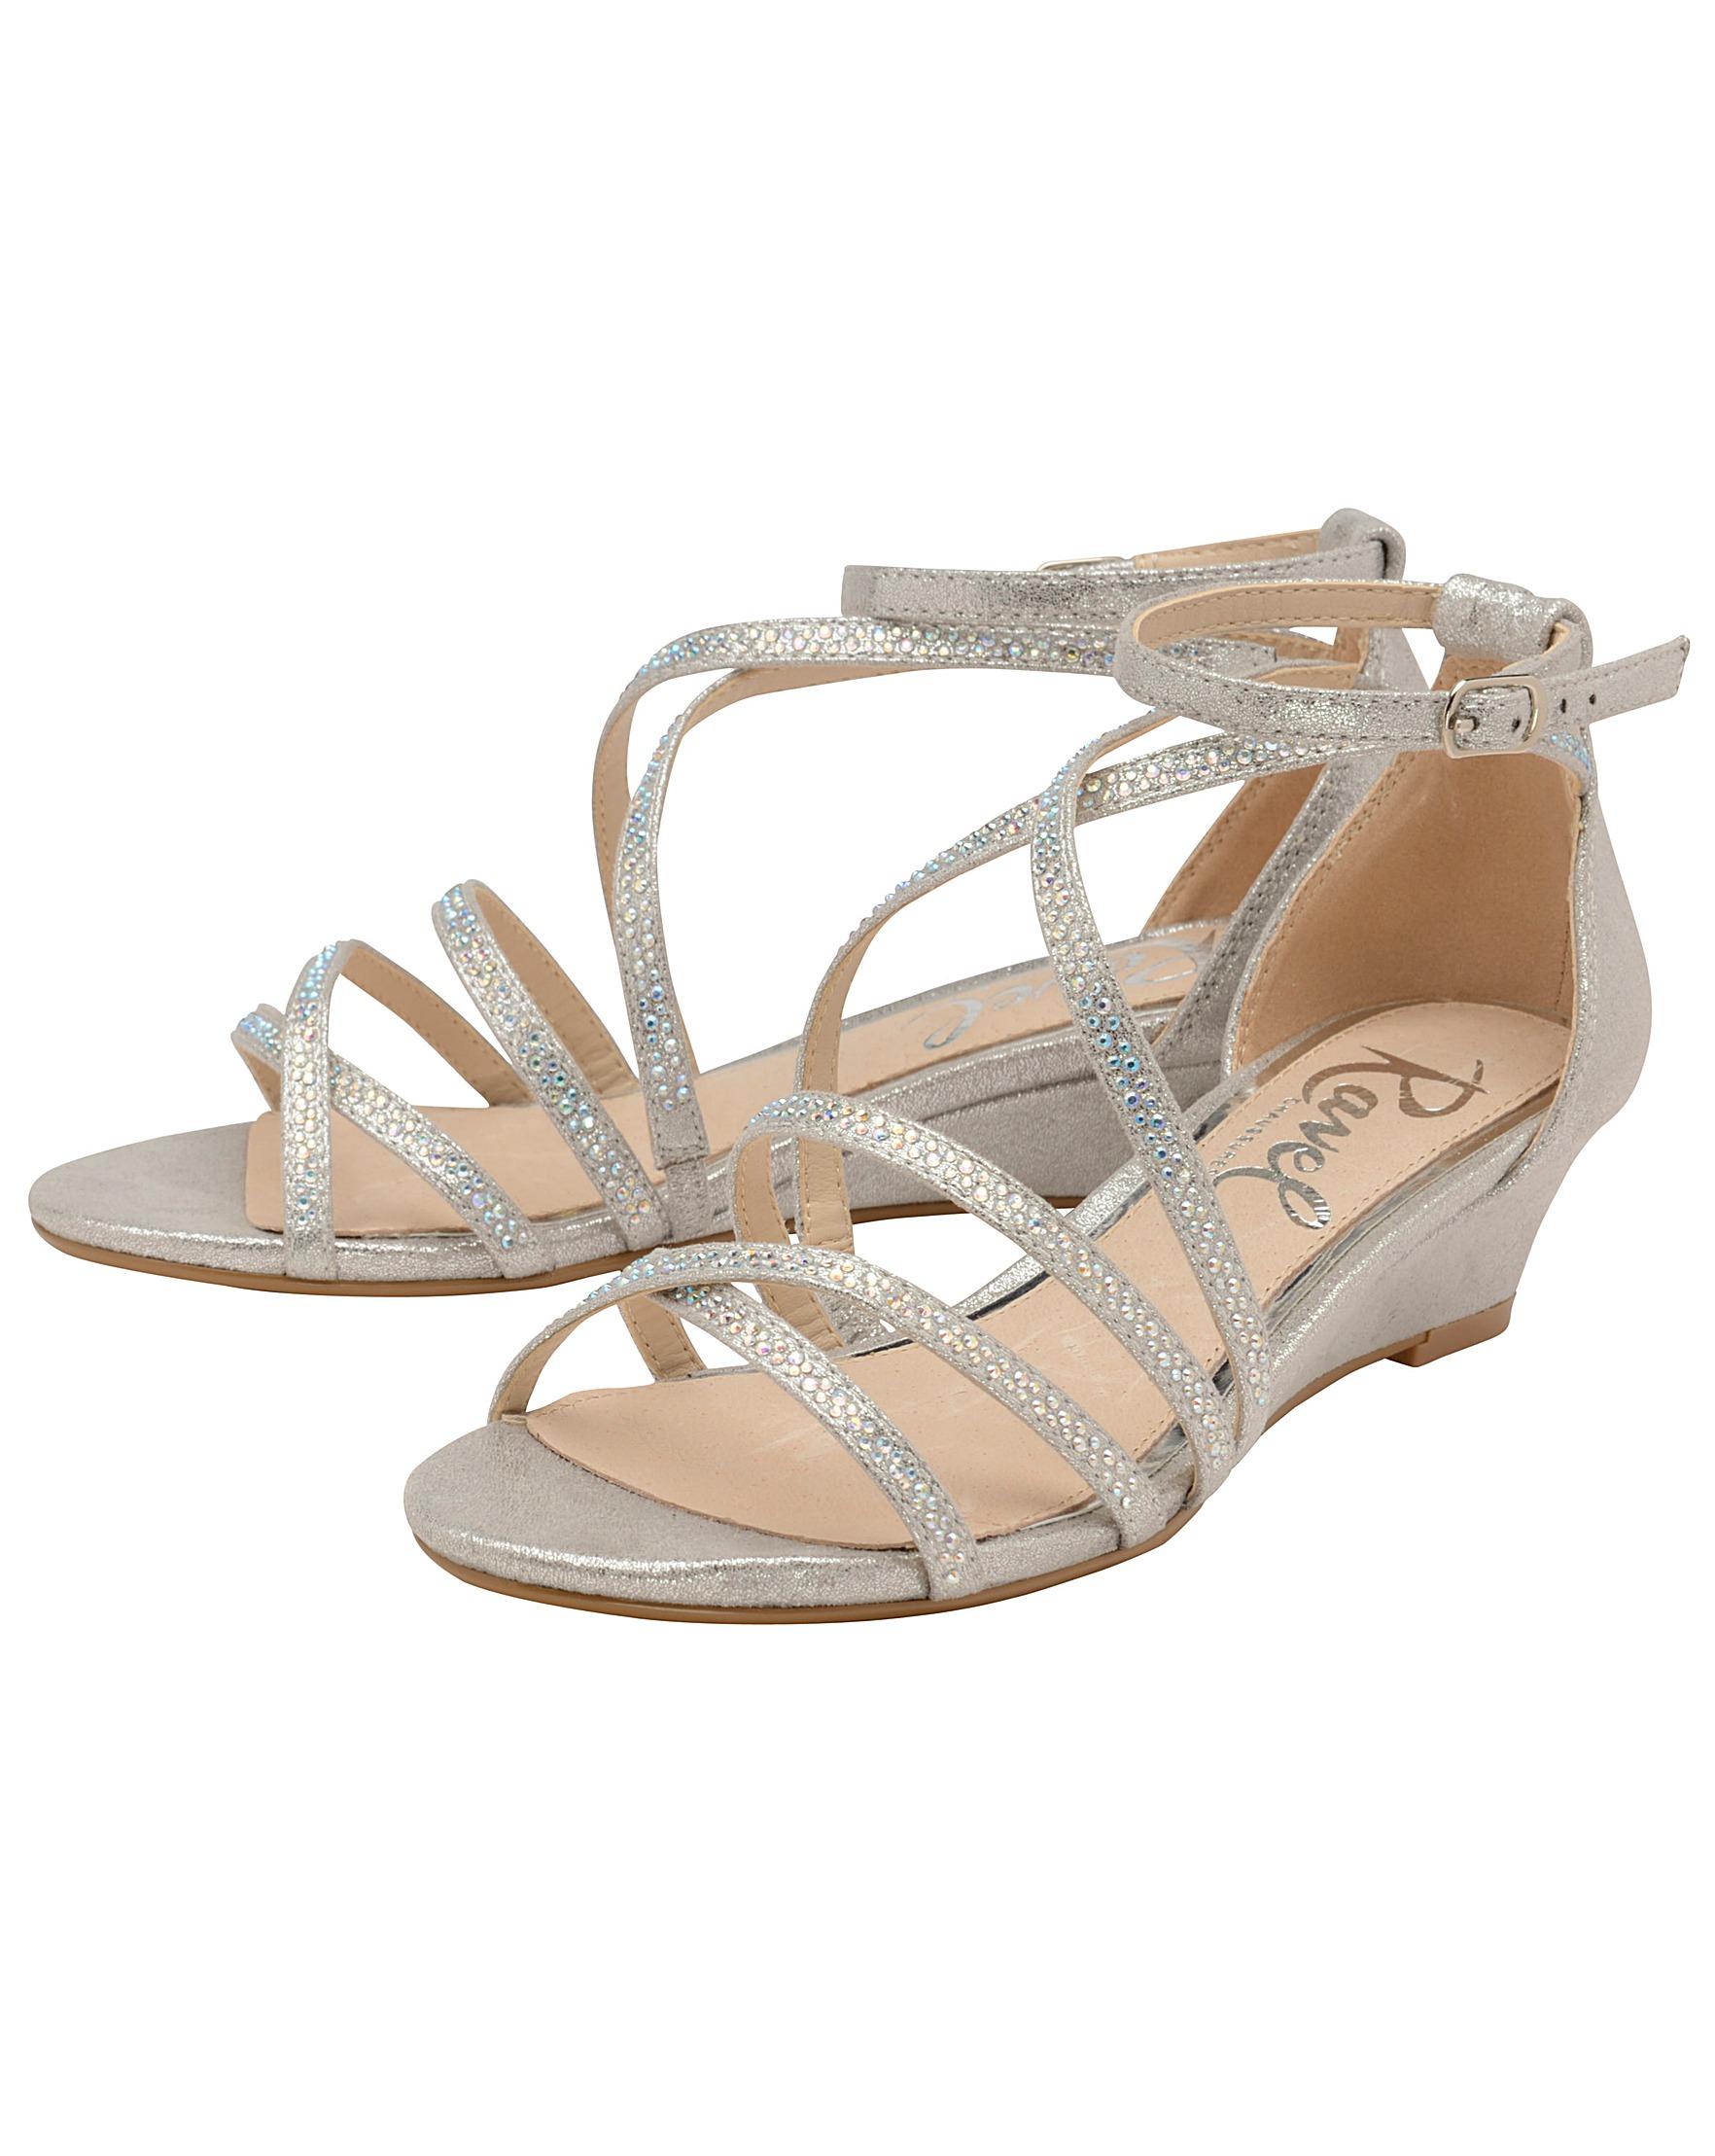 5156da90a9da Ravel Rosa Strappy Wedge Sandals